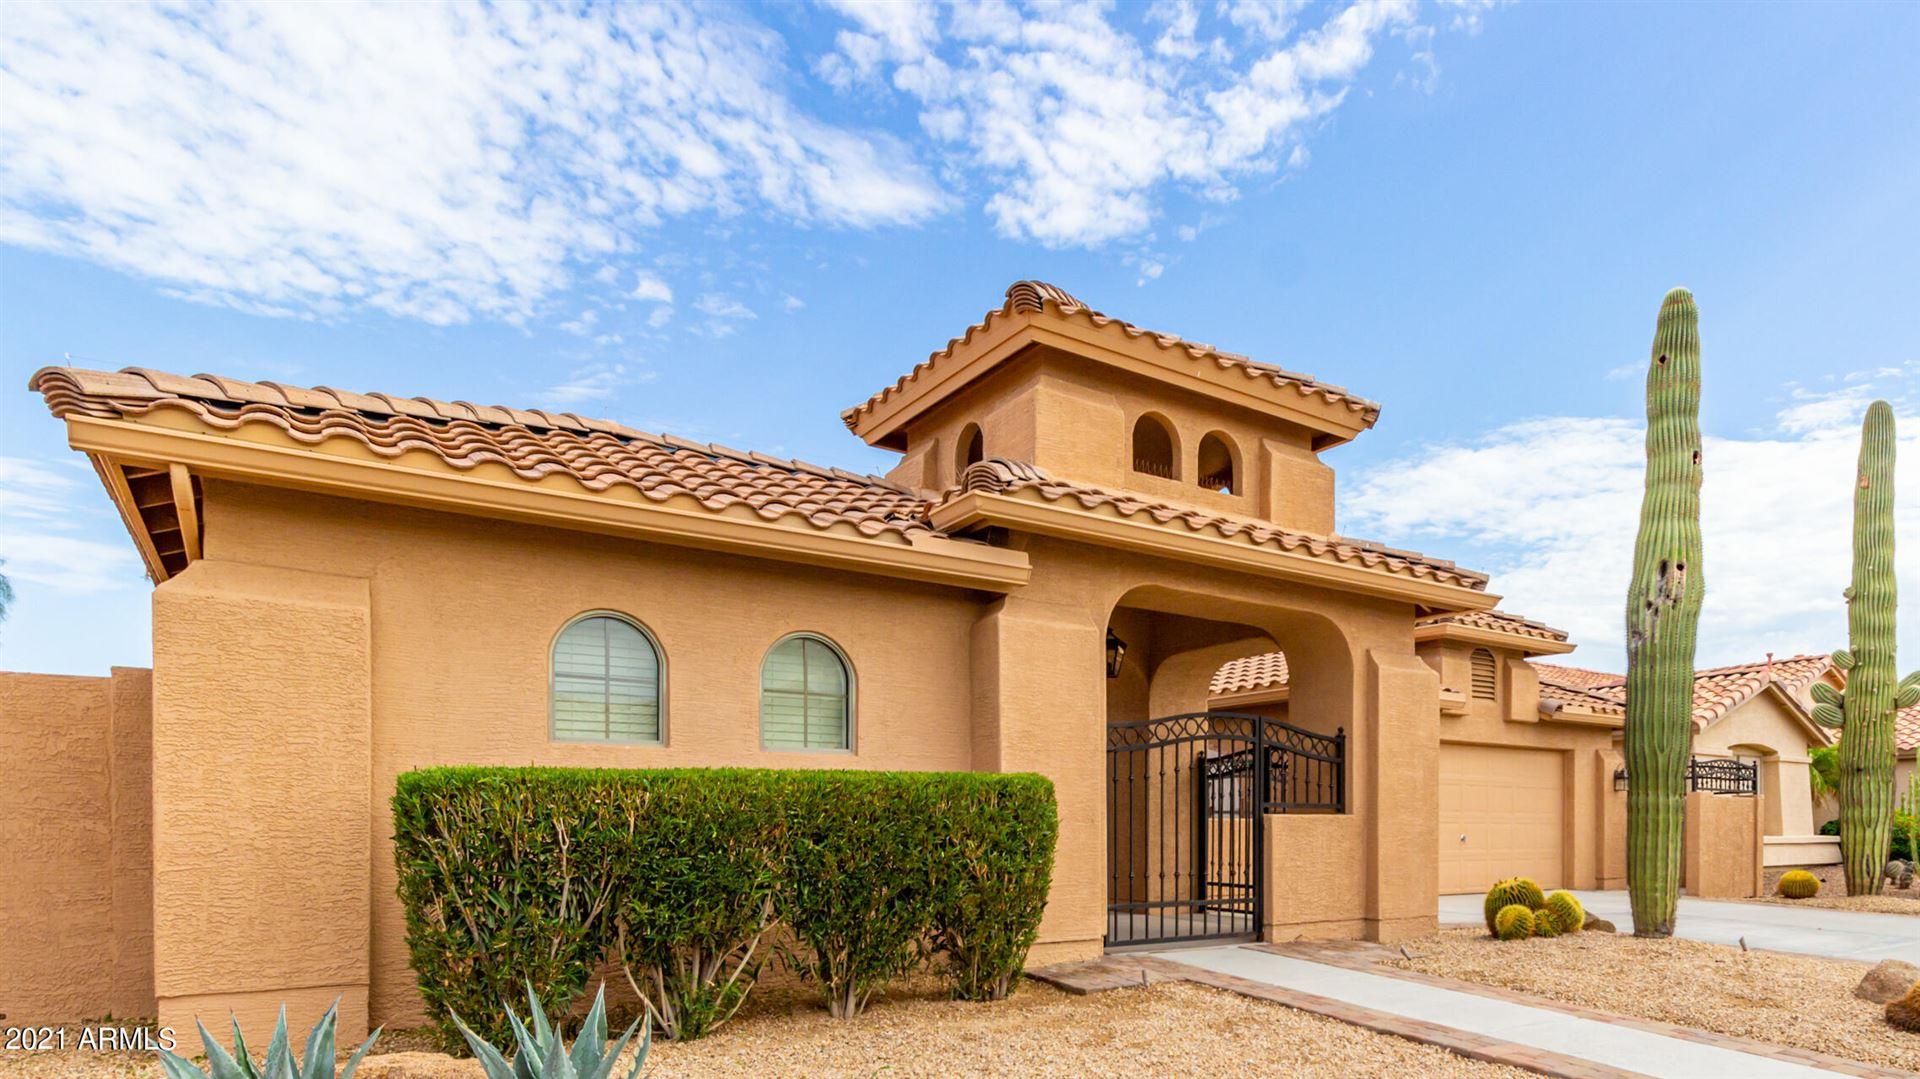 Photo of 24222 S BRIARCREST Drive, Sun Lakes, AZ 85248 (MLS # 6271876)